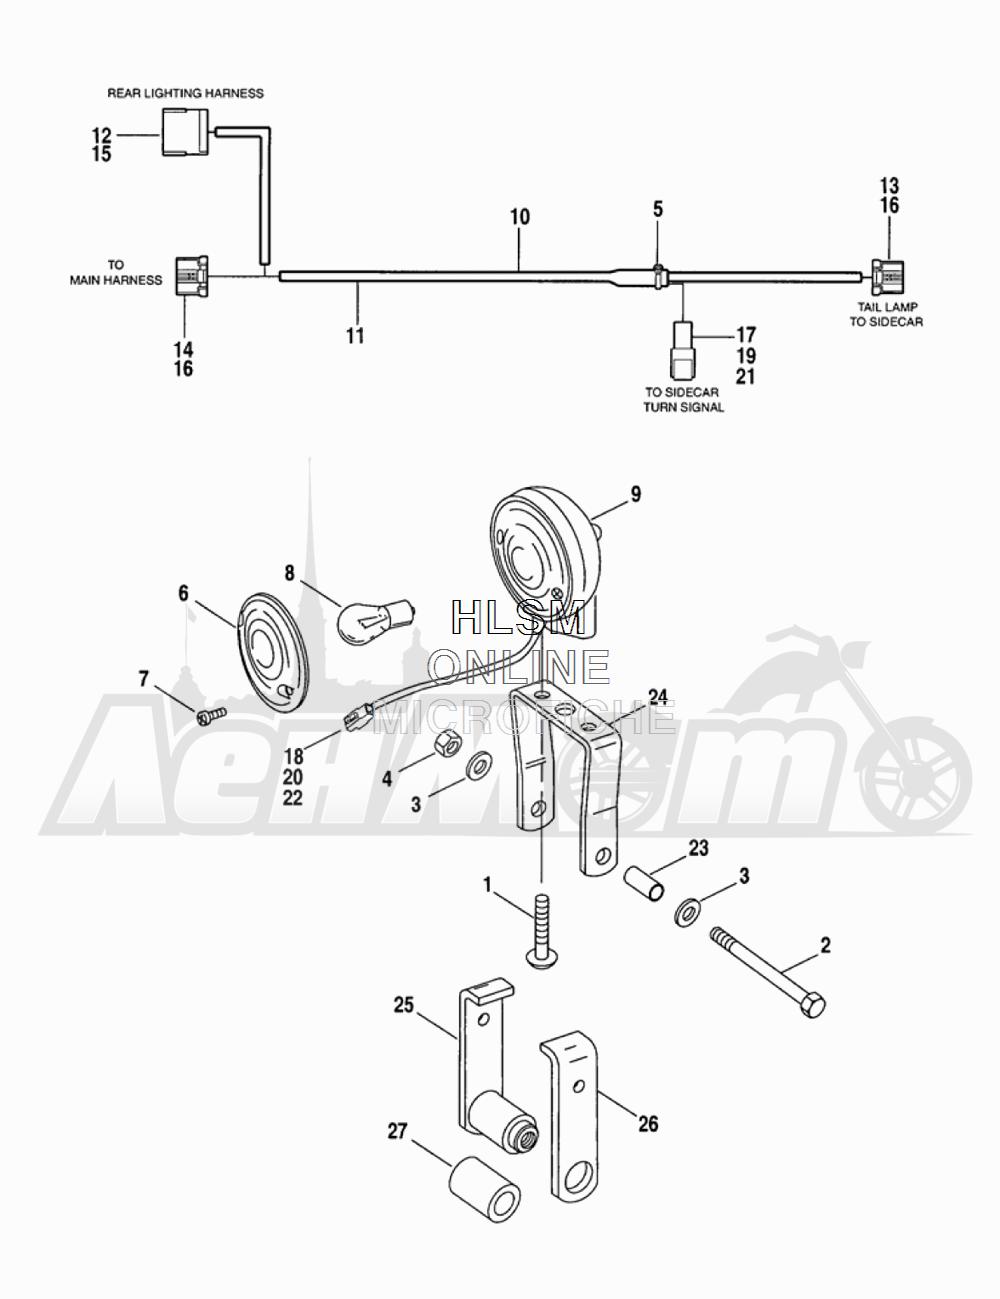 Запчасти для Мотоцикла Harley-Davidson 2005 TLEU - SIDE CAR ULTRA Раздел: TURN SIGNAL ASSEMPLY | сигнал поворота ASSEMPLY